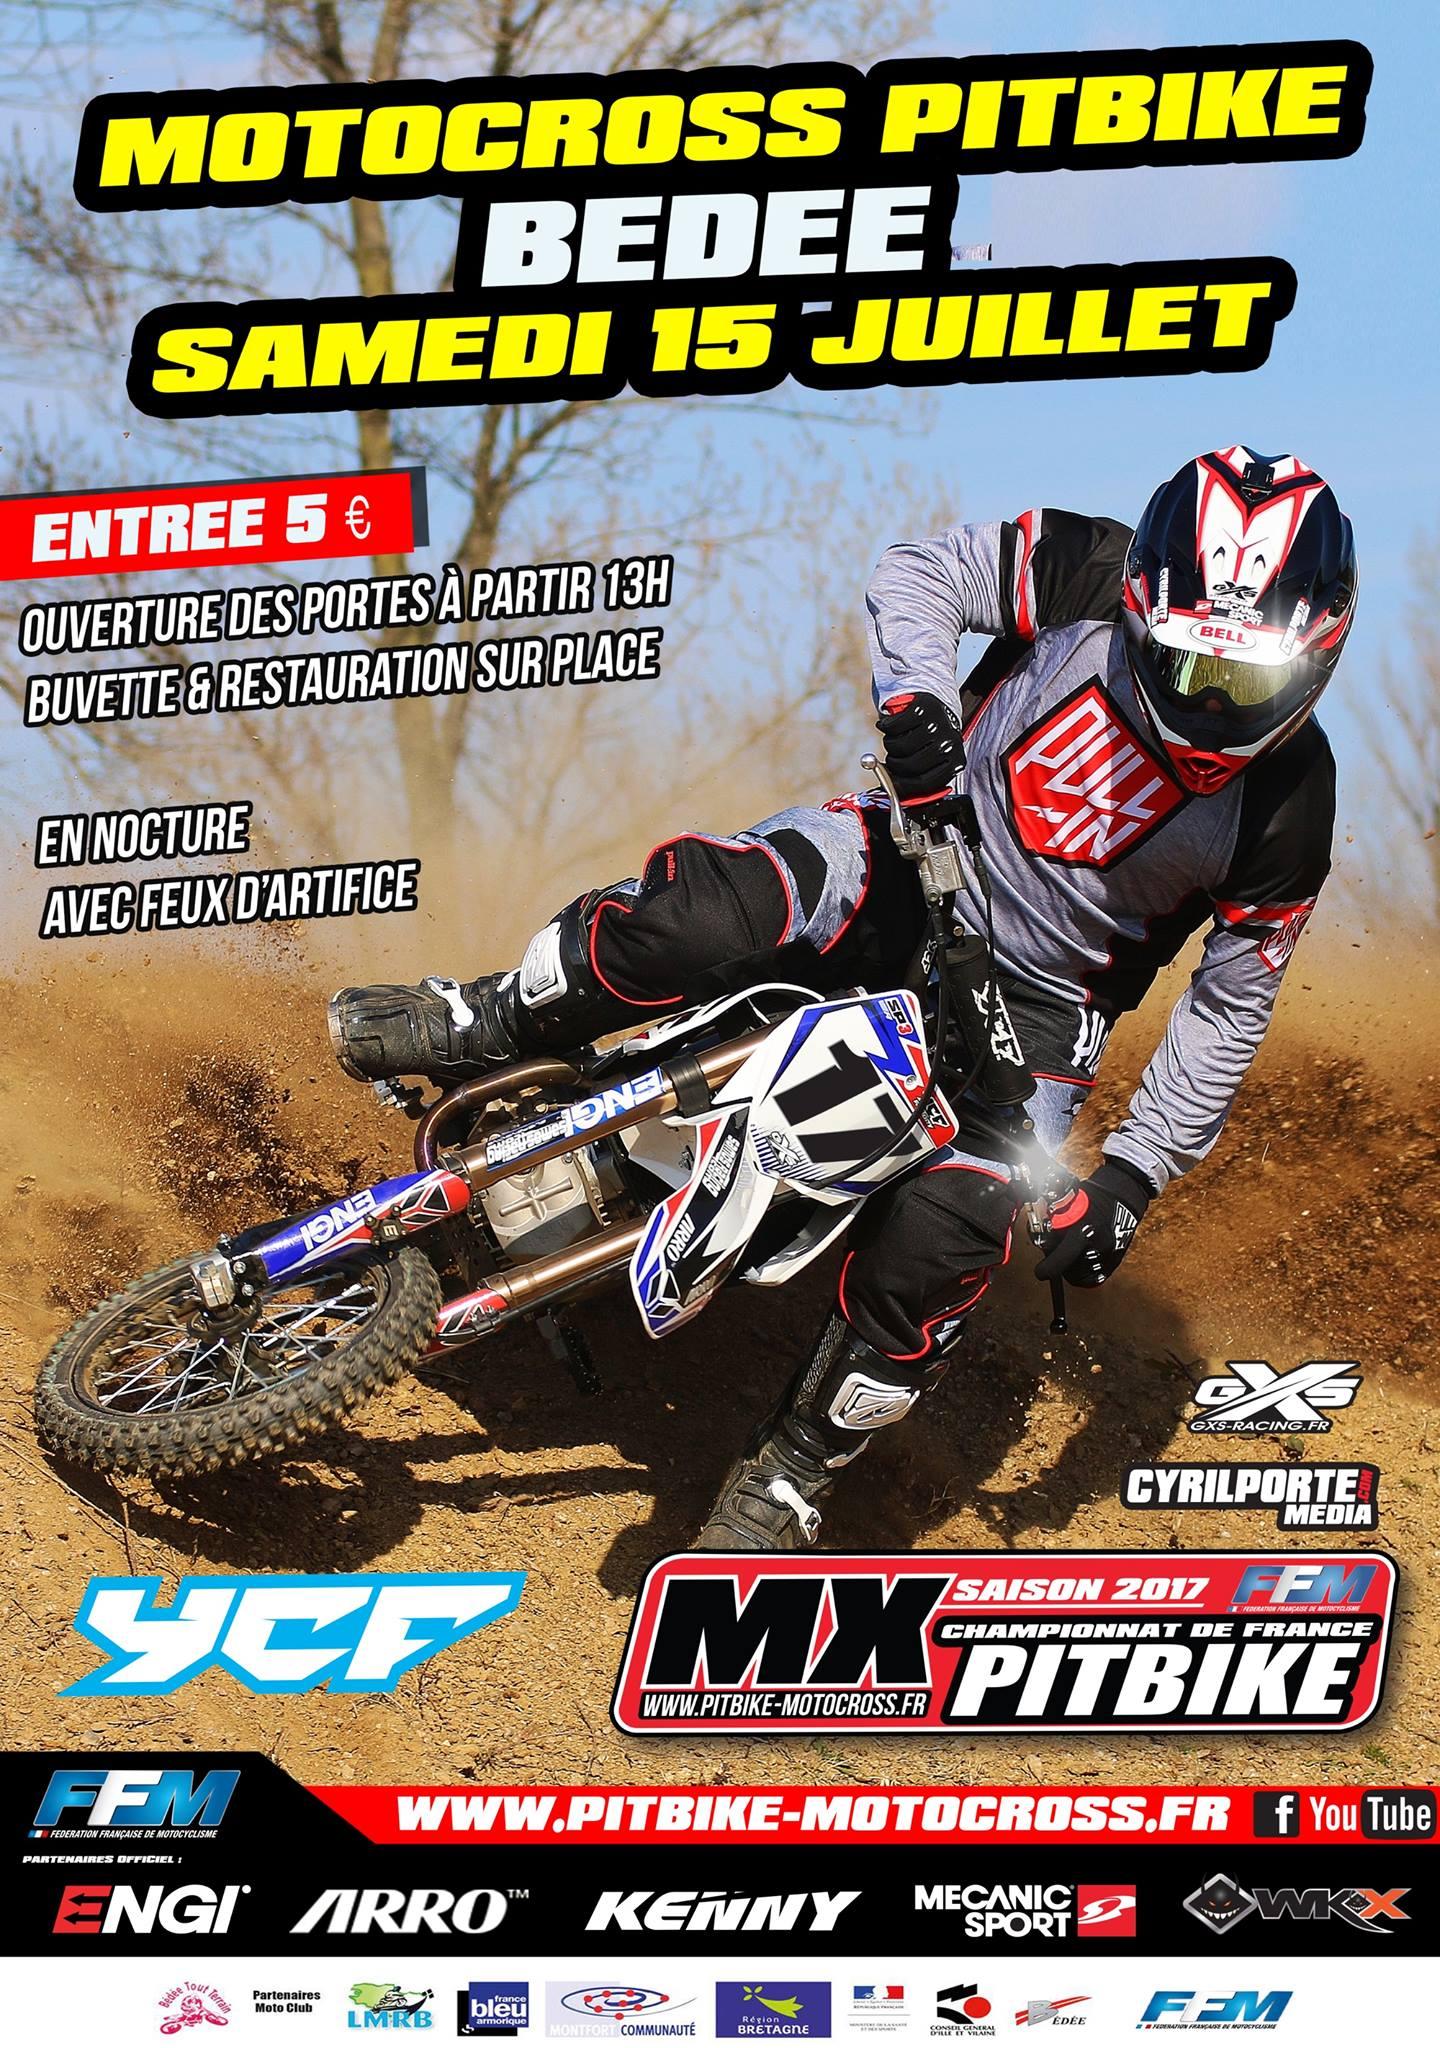 affiche bedee pit bike 2017